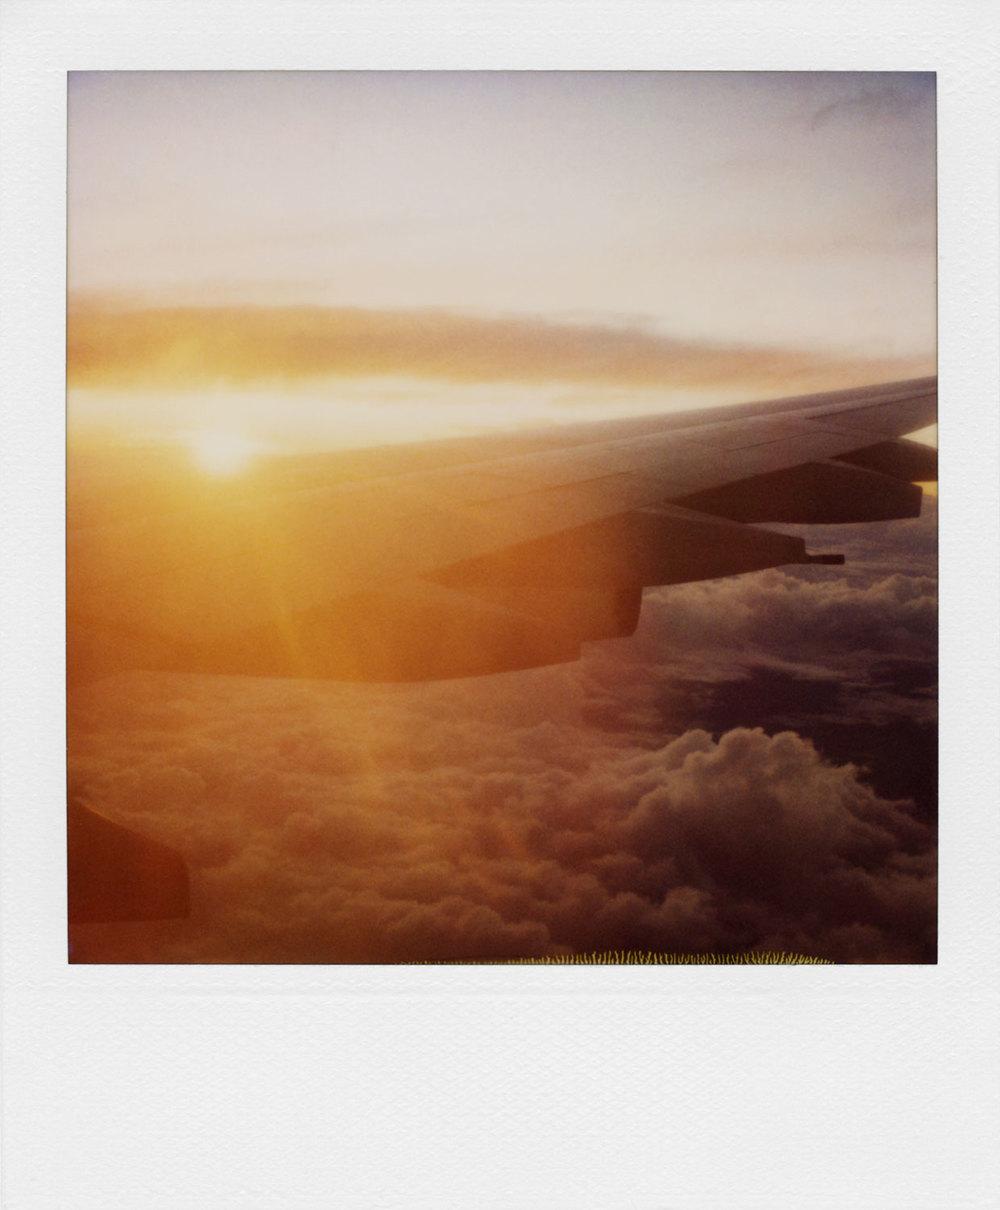 polaroid-48.jpg